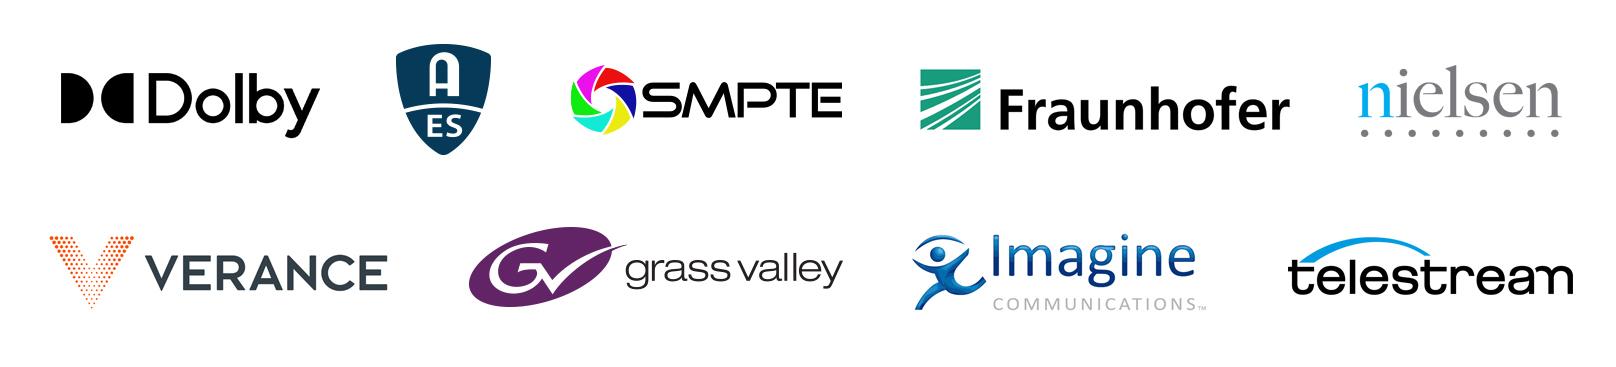 Partners Page Logos_v2